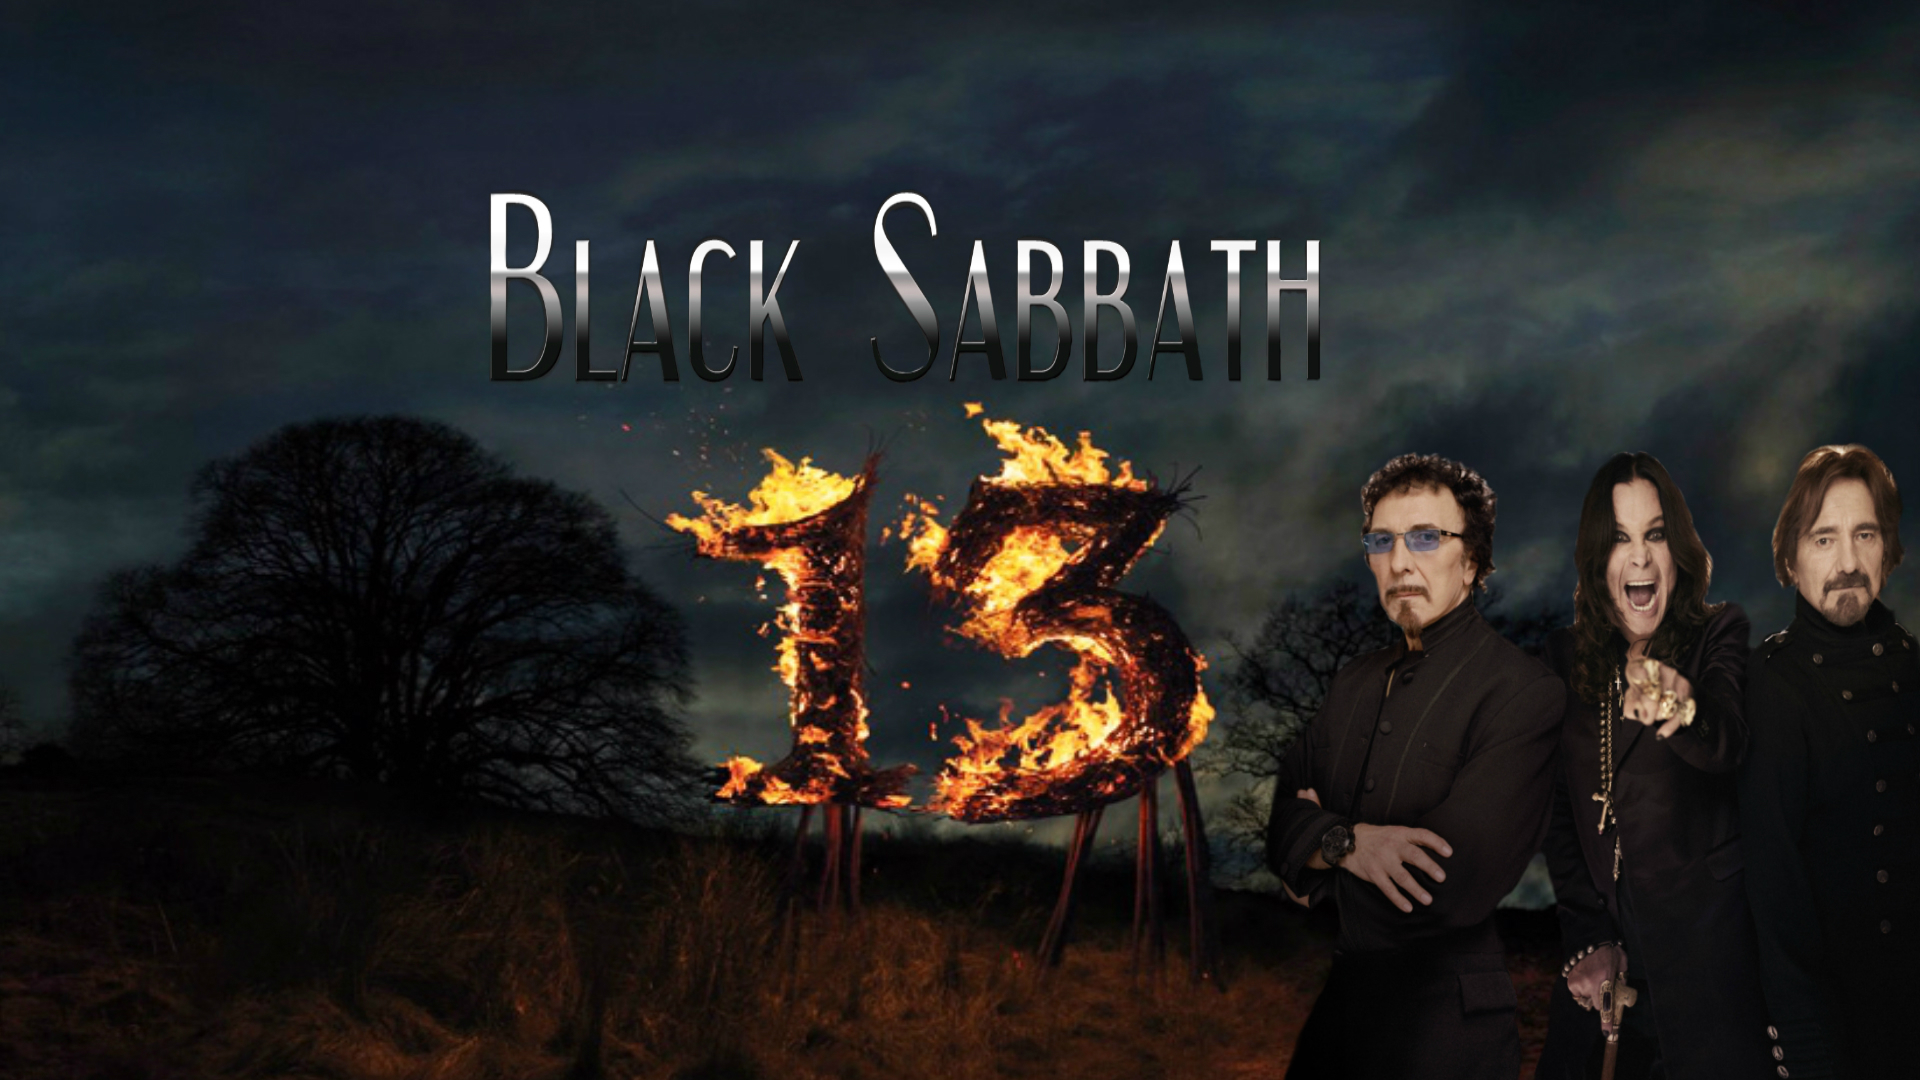 Black Sabbath Full Hd Wallpaper And Background Image